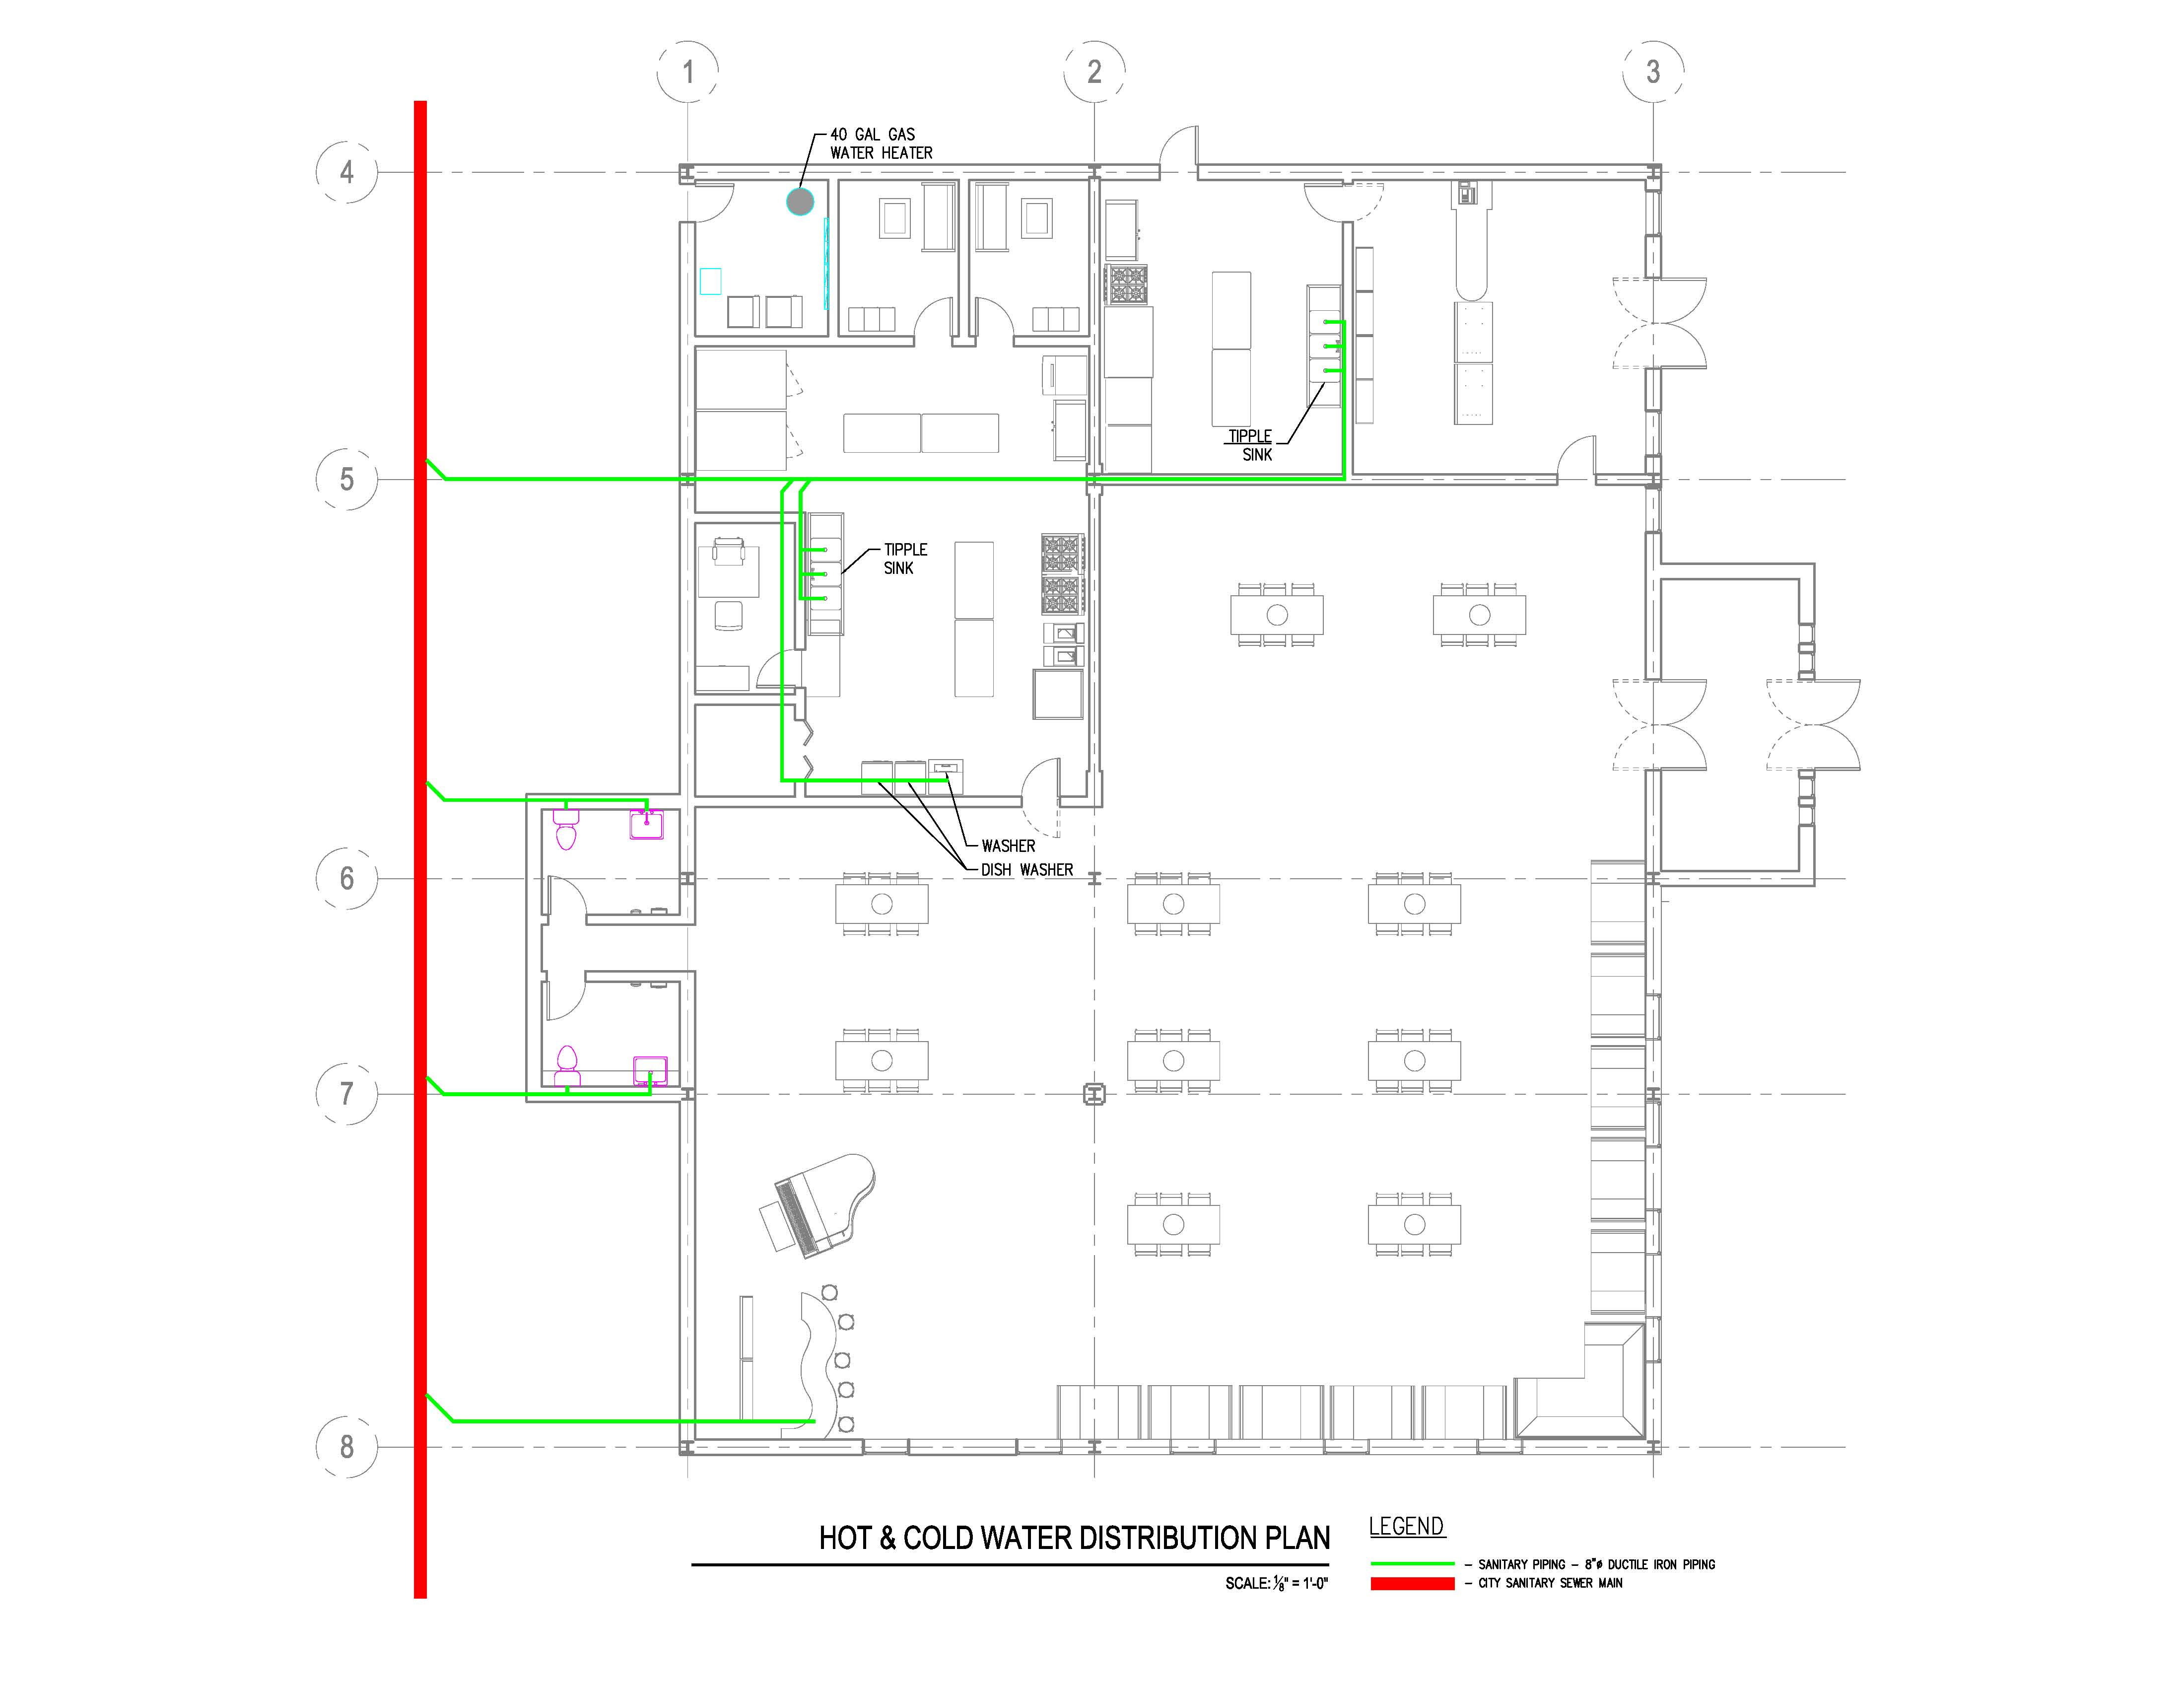 plumbing sanitary riser diagram 2003 dodge ram 1500 window wiring system electrical and design